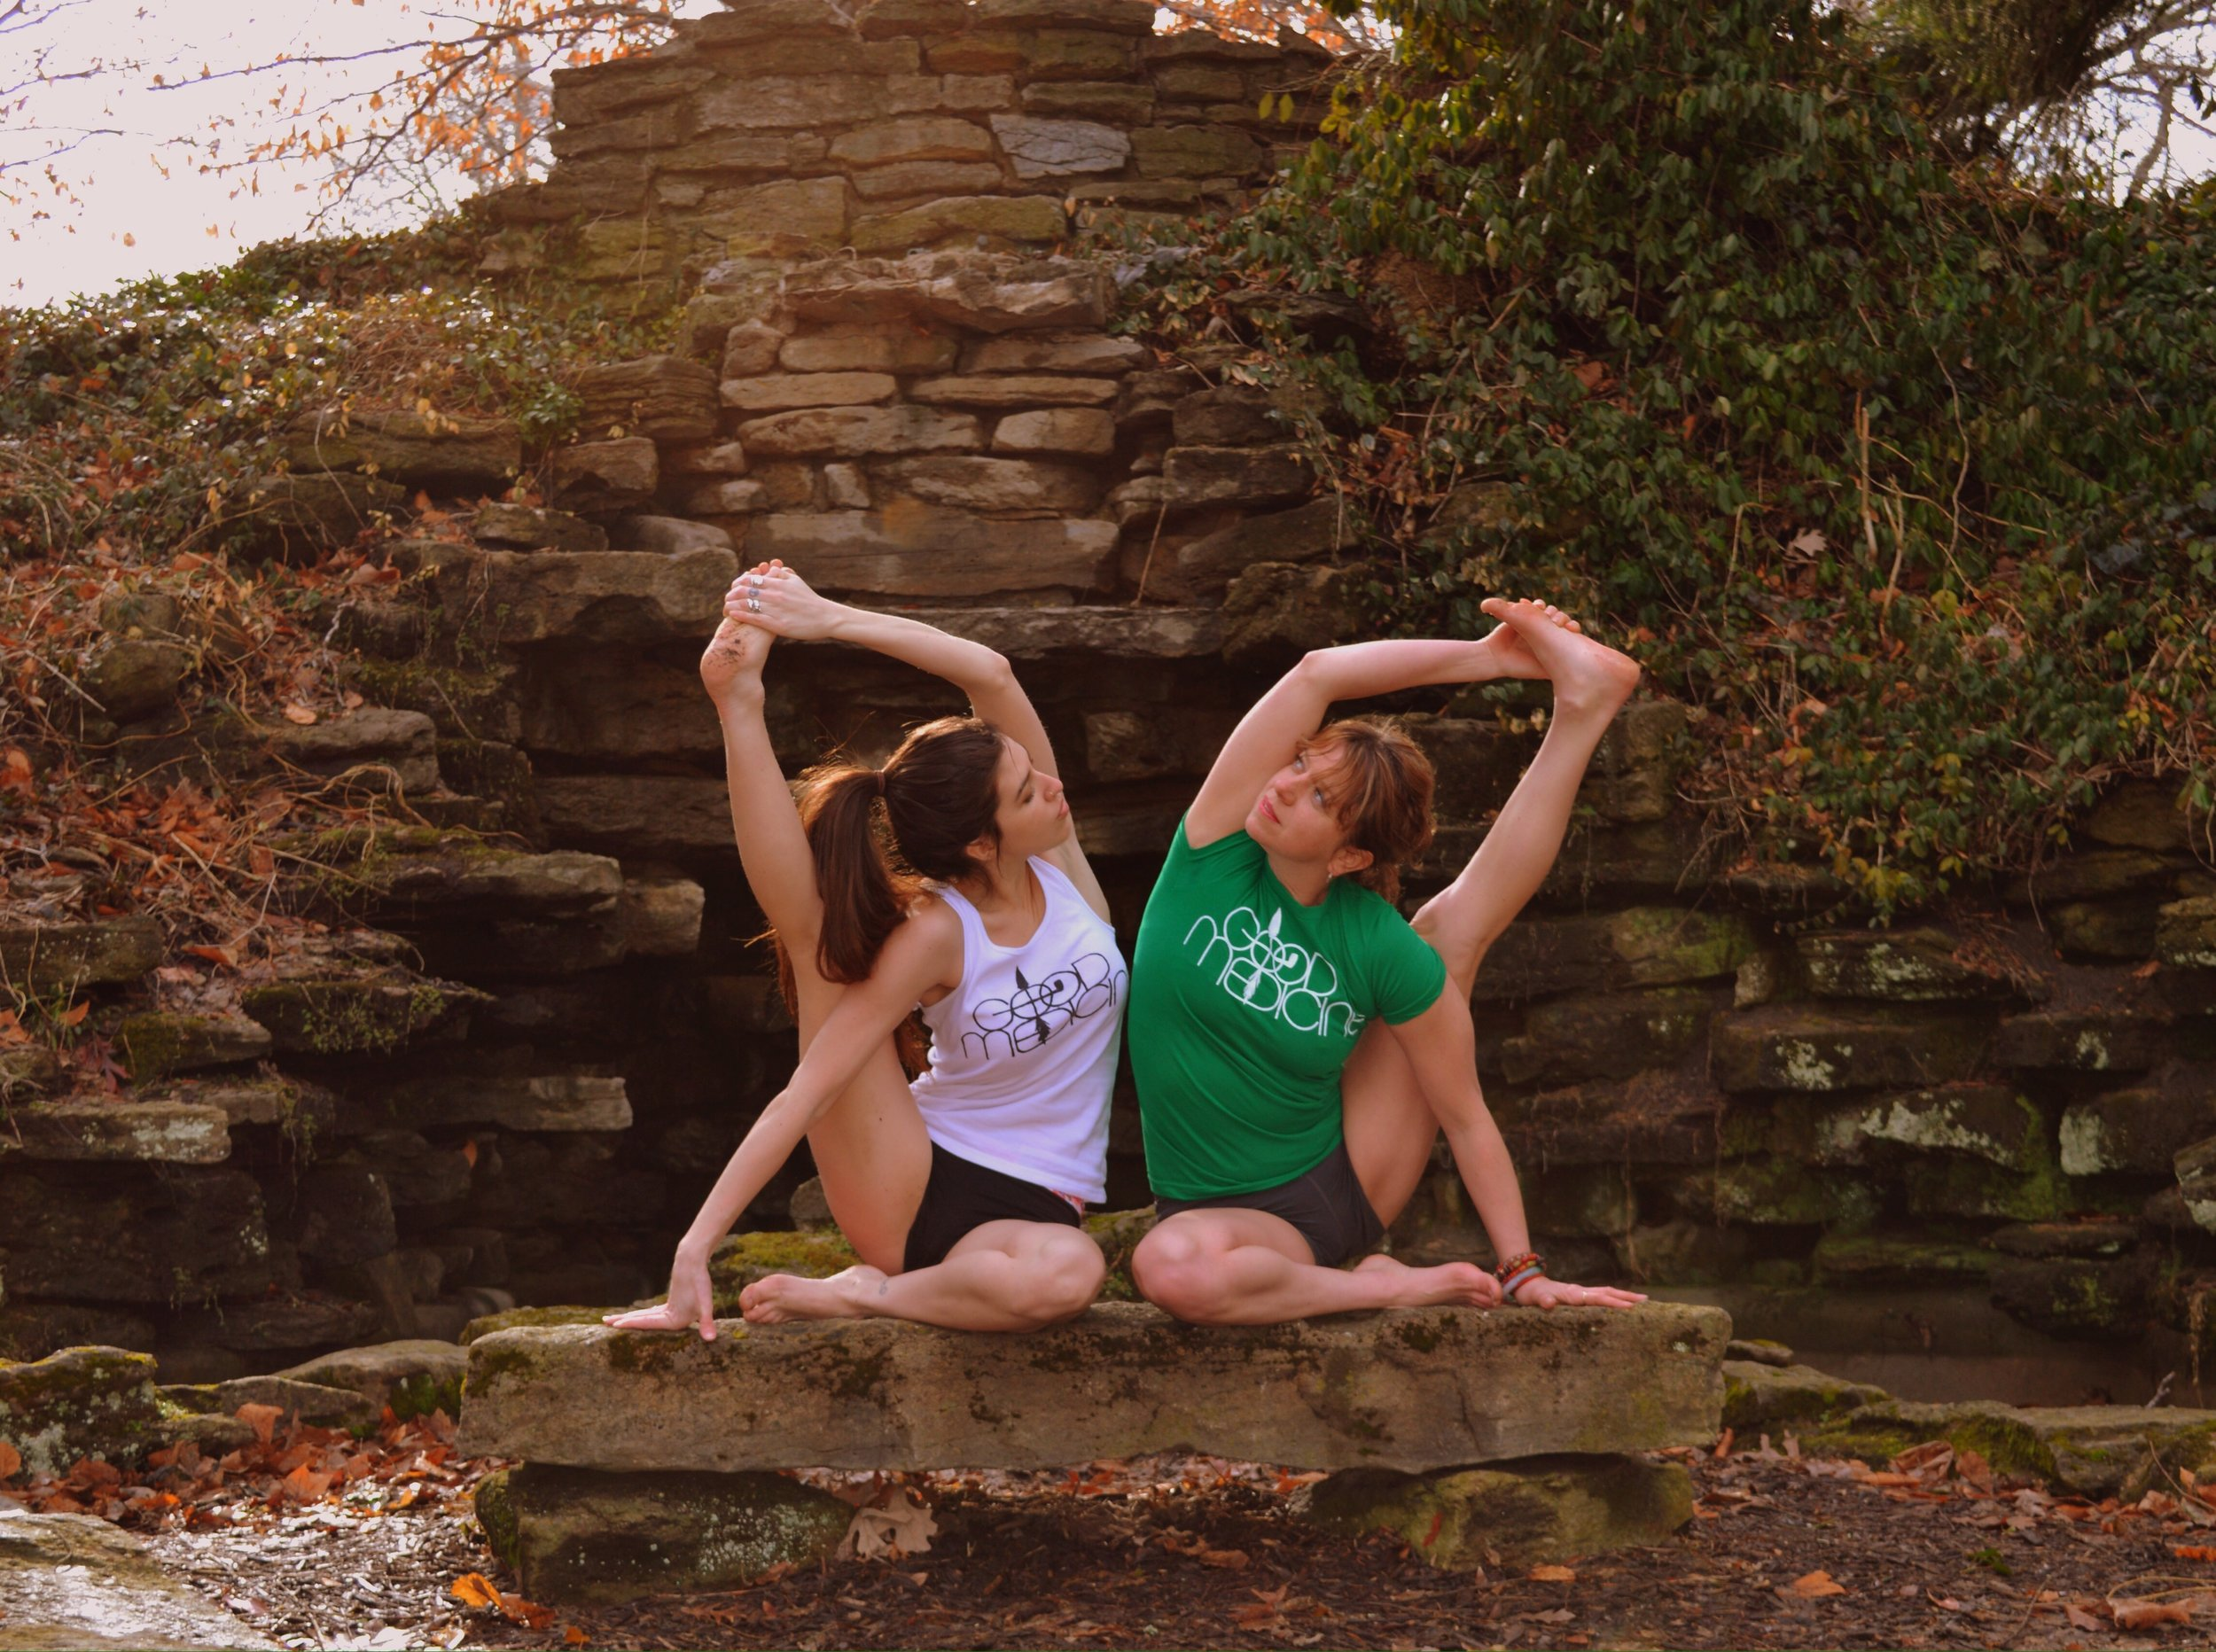 Amber gean and business partner yanna nicole founders of Yoga ah Studio in Cincinnati, ohio.